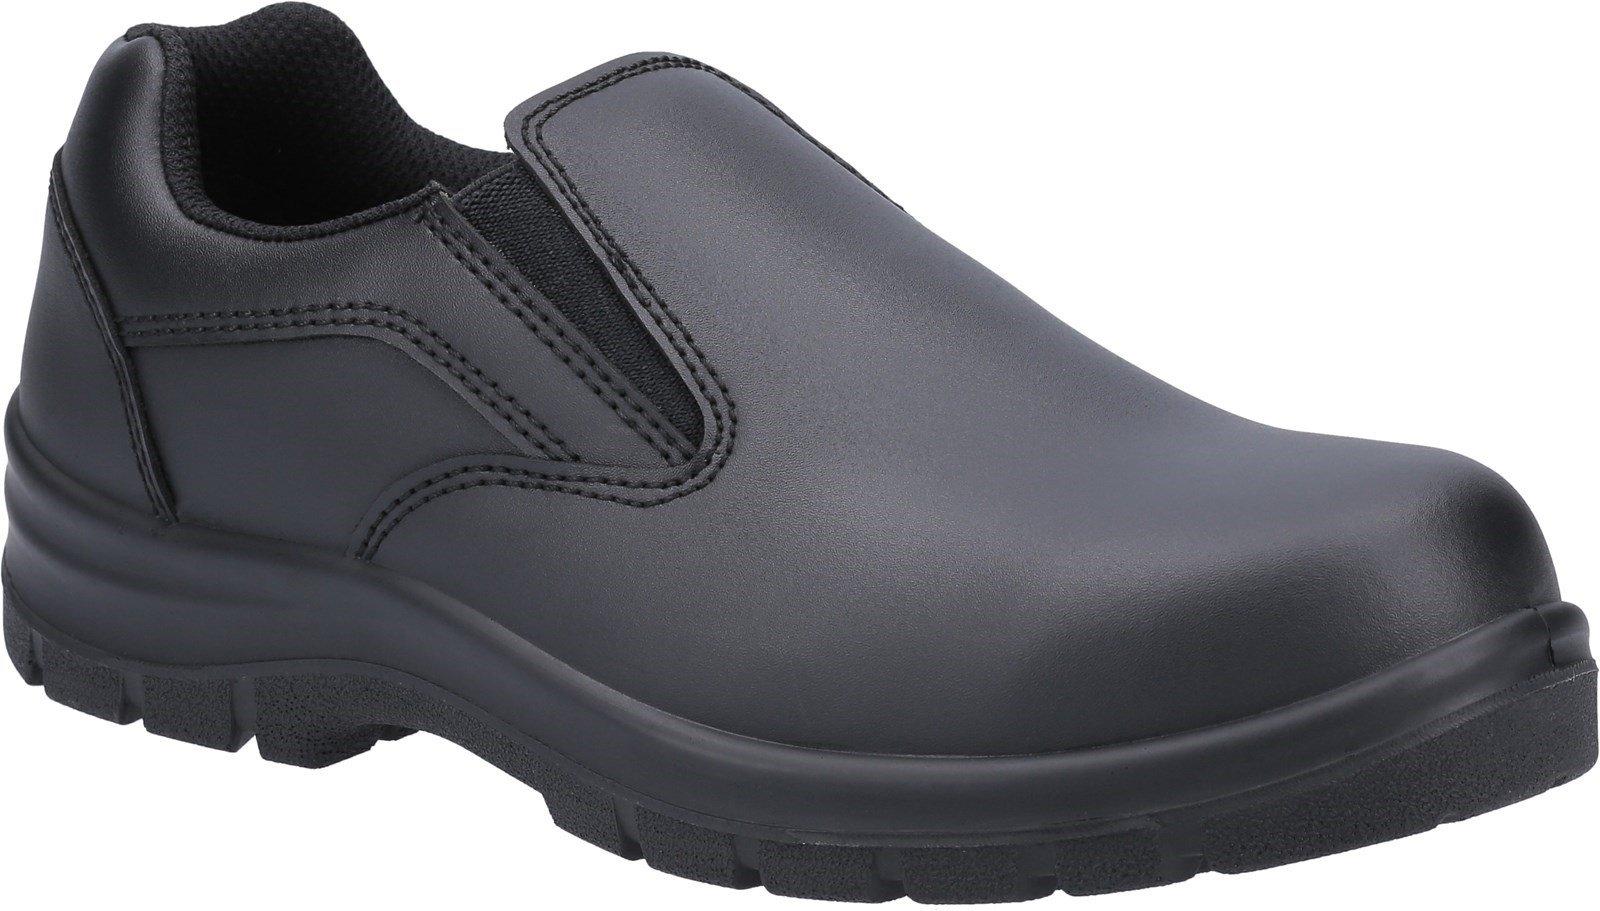 Amblers Women's Safety Boot Black 31371 - Black 3